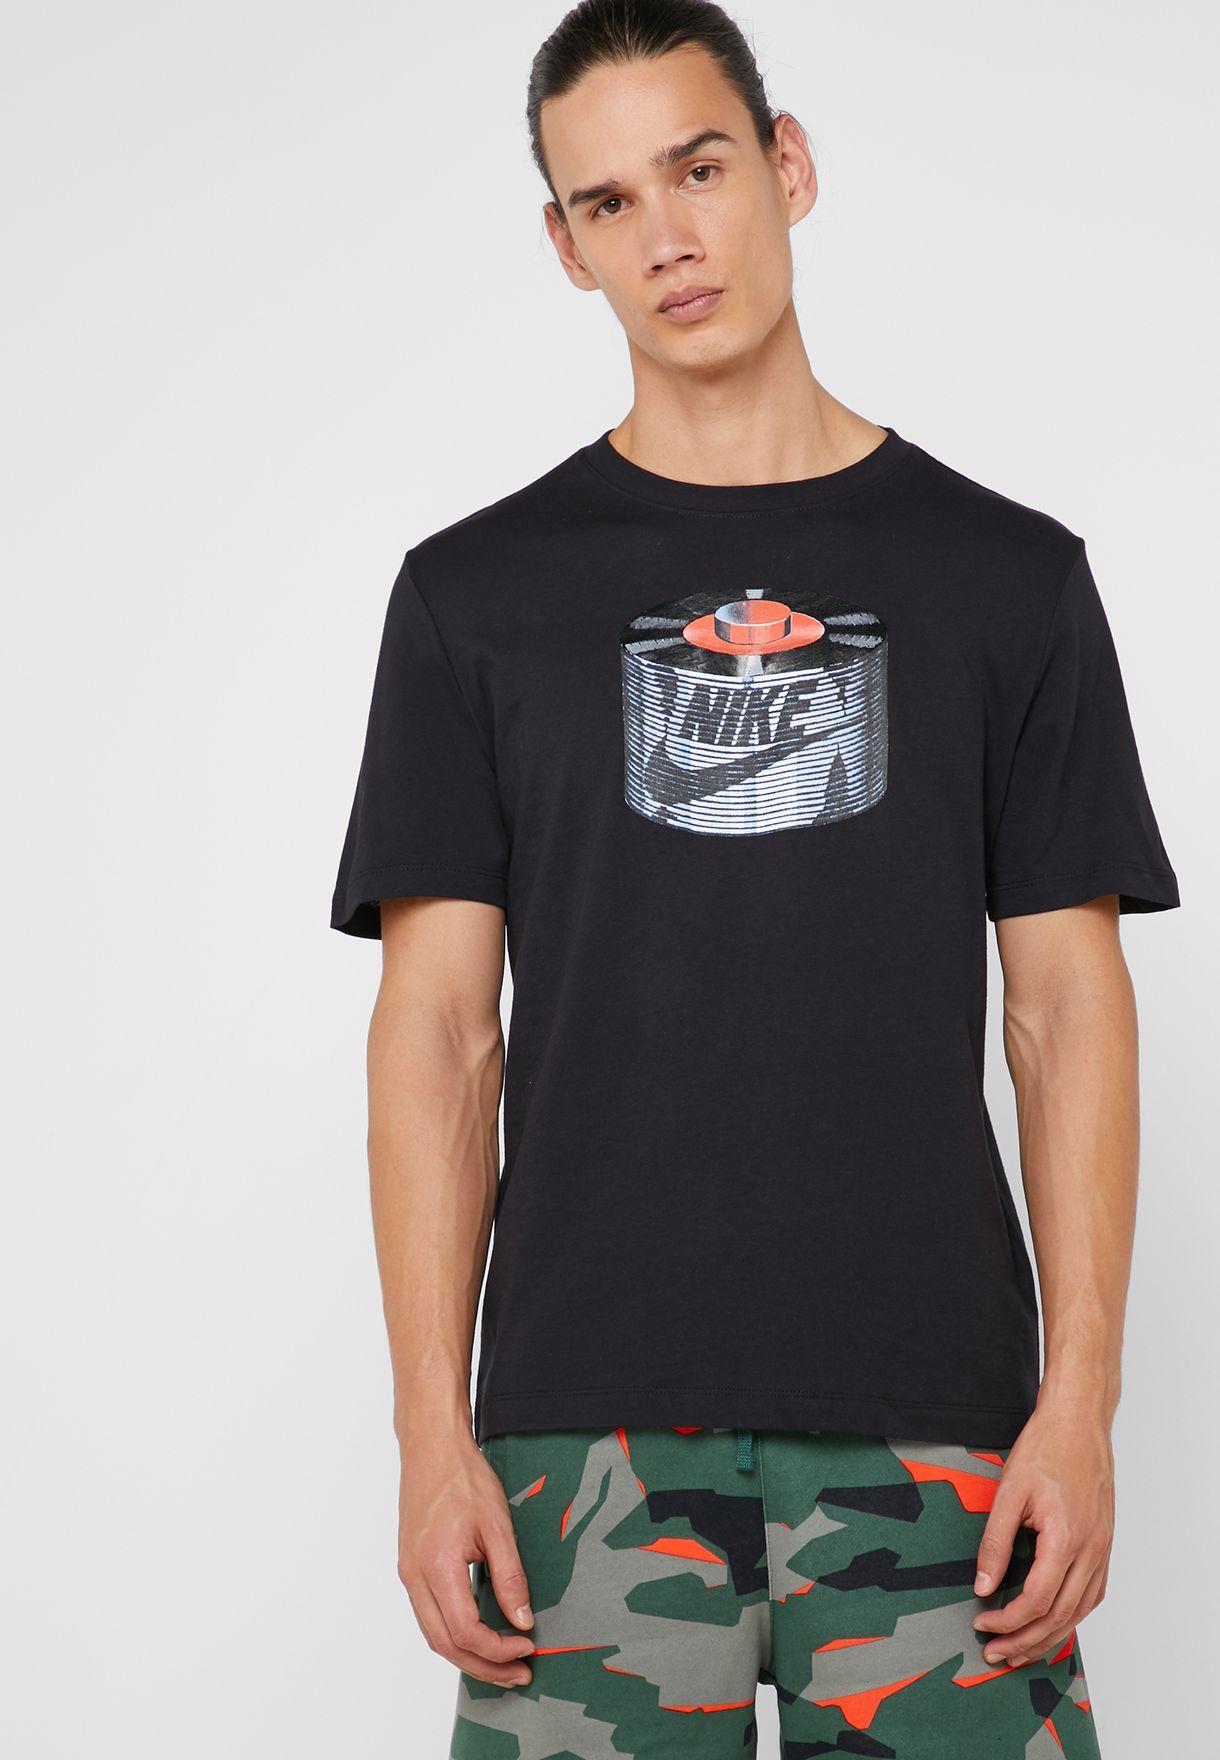 NSW Remix T-Shirt